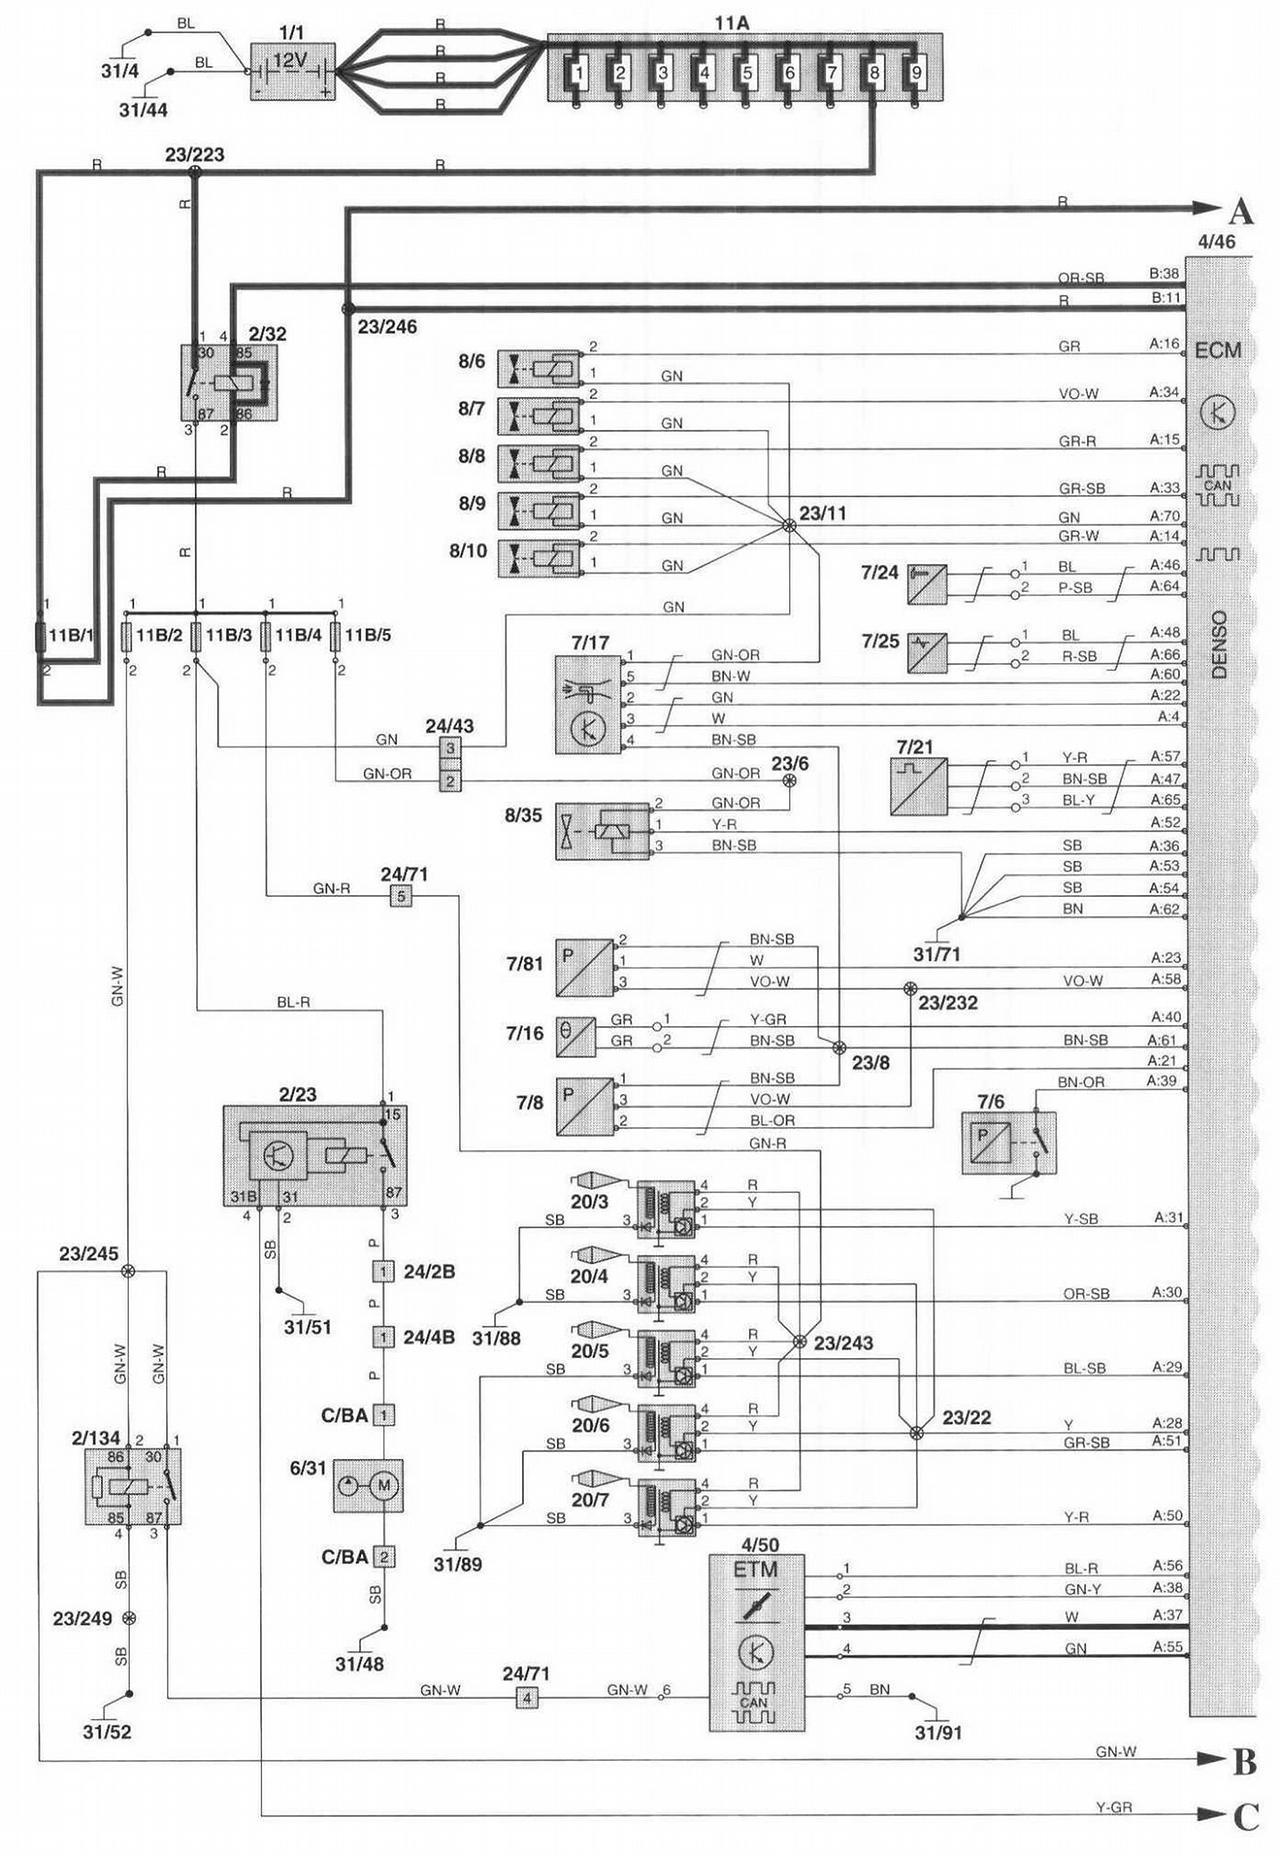 volvo xc90 headlight wiring diagram - wiring diagram data headlight wiring diagram 2001 volvo s60 2004 volvo xc90 relay diagram tennisabtlg-tus-erfenbach.de